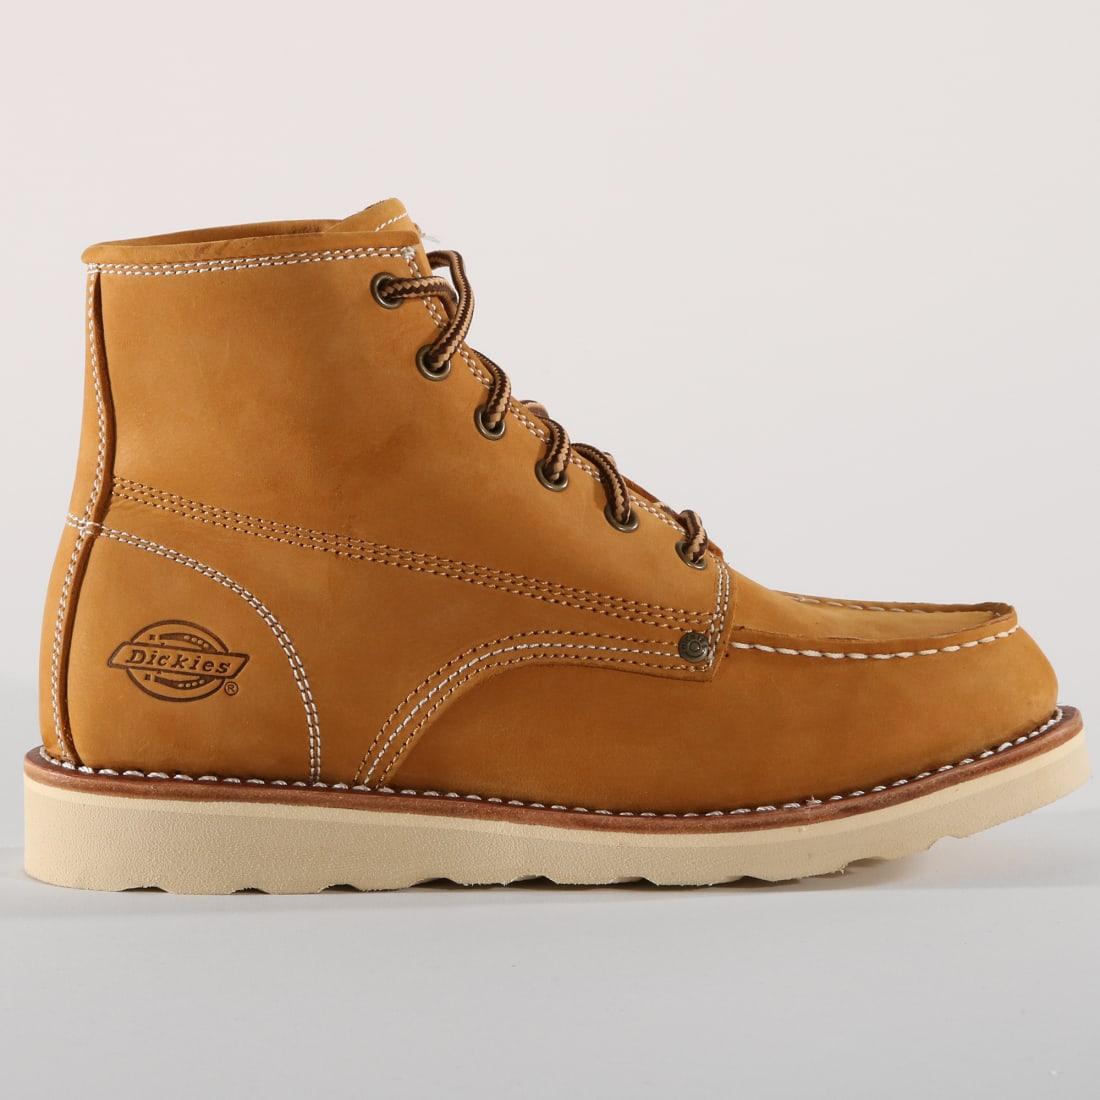 Dickies New Orleans Chaussures Beige 41